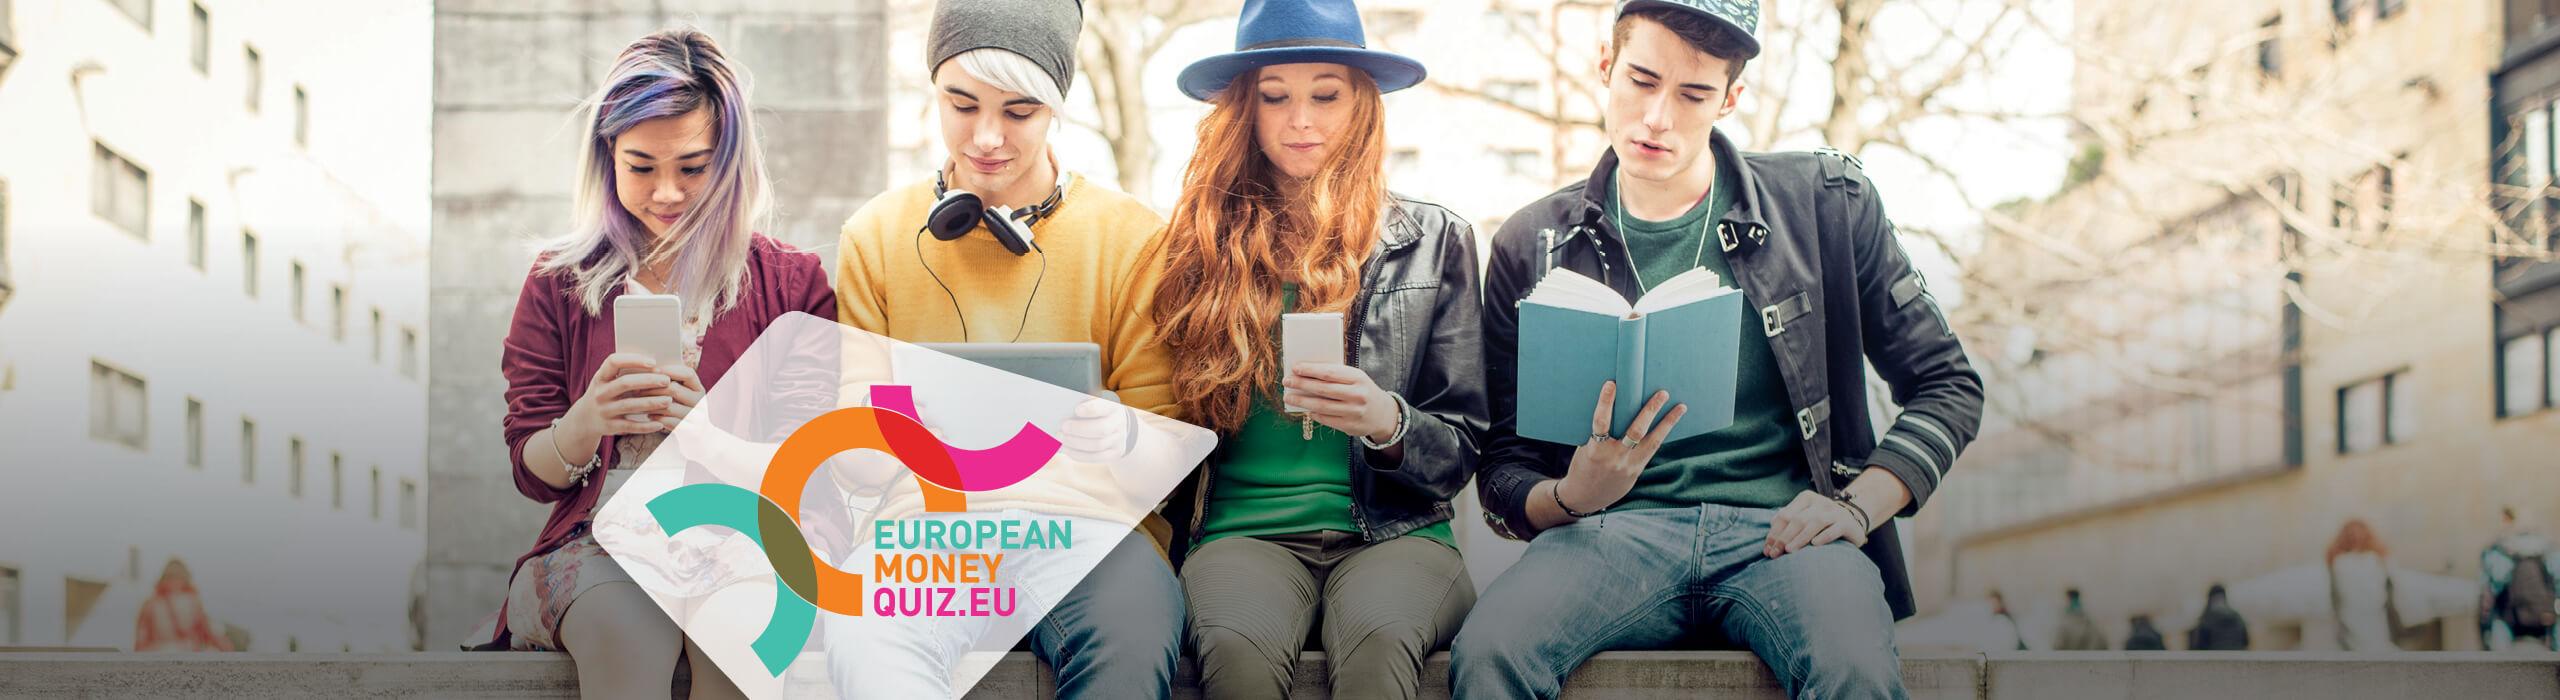 IFB-banner-EuropeanMoneyQuiz